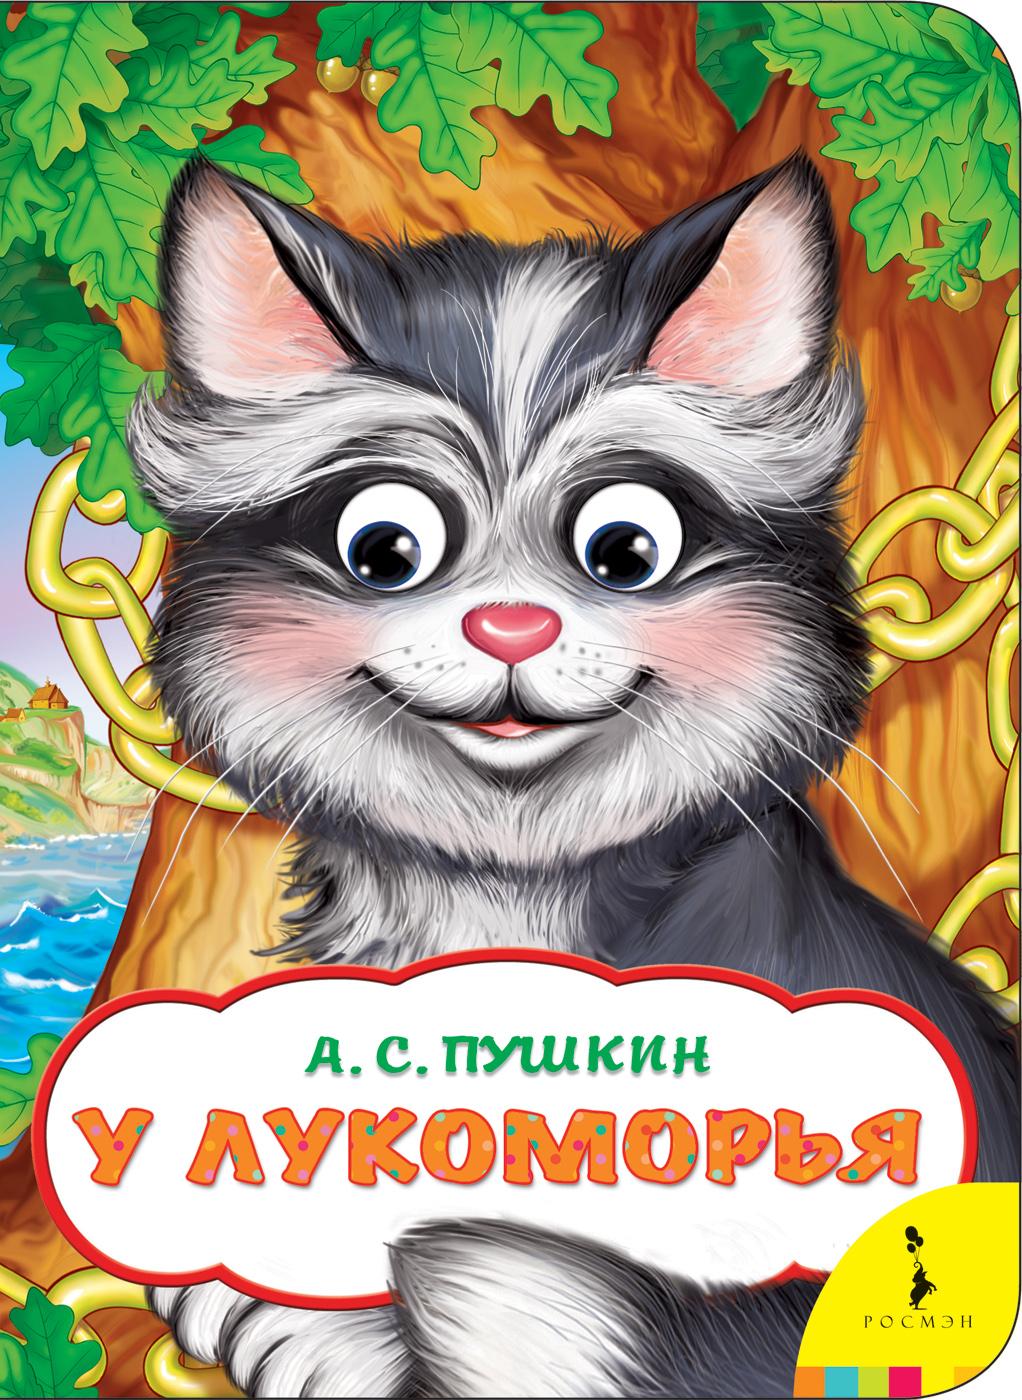 Пушкин А.С. У Лукоморья (Веселые глазки) записки черномора